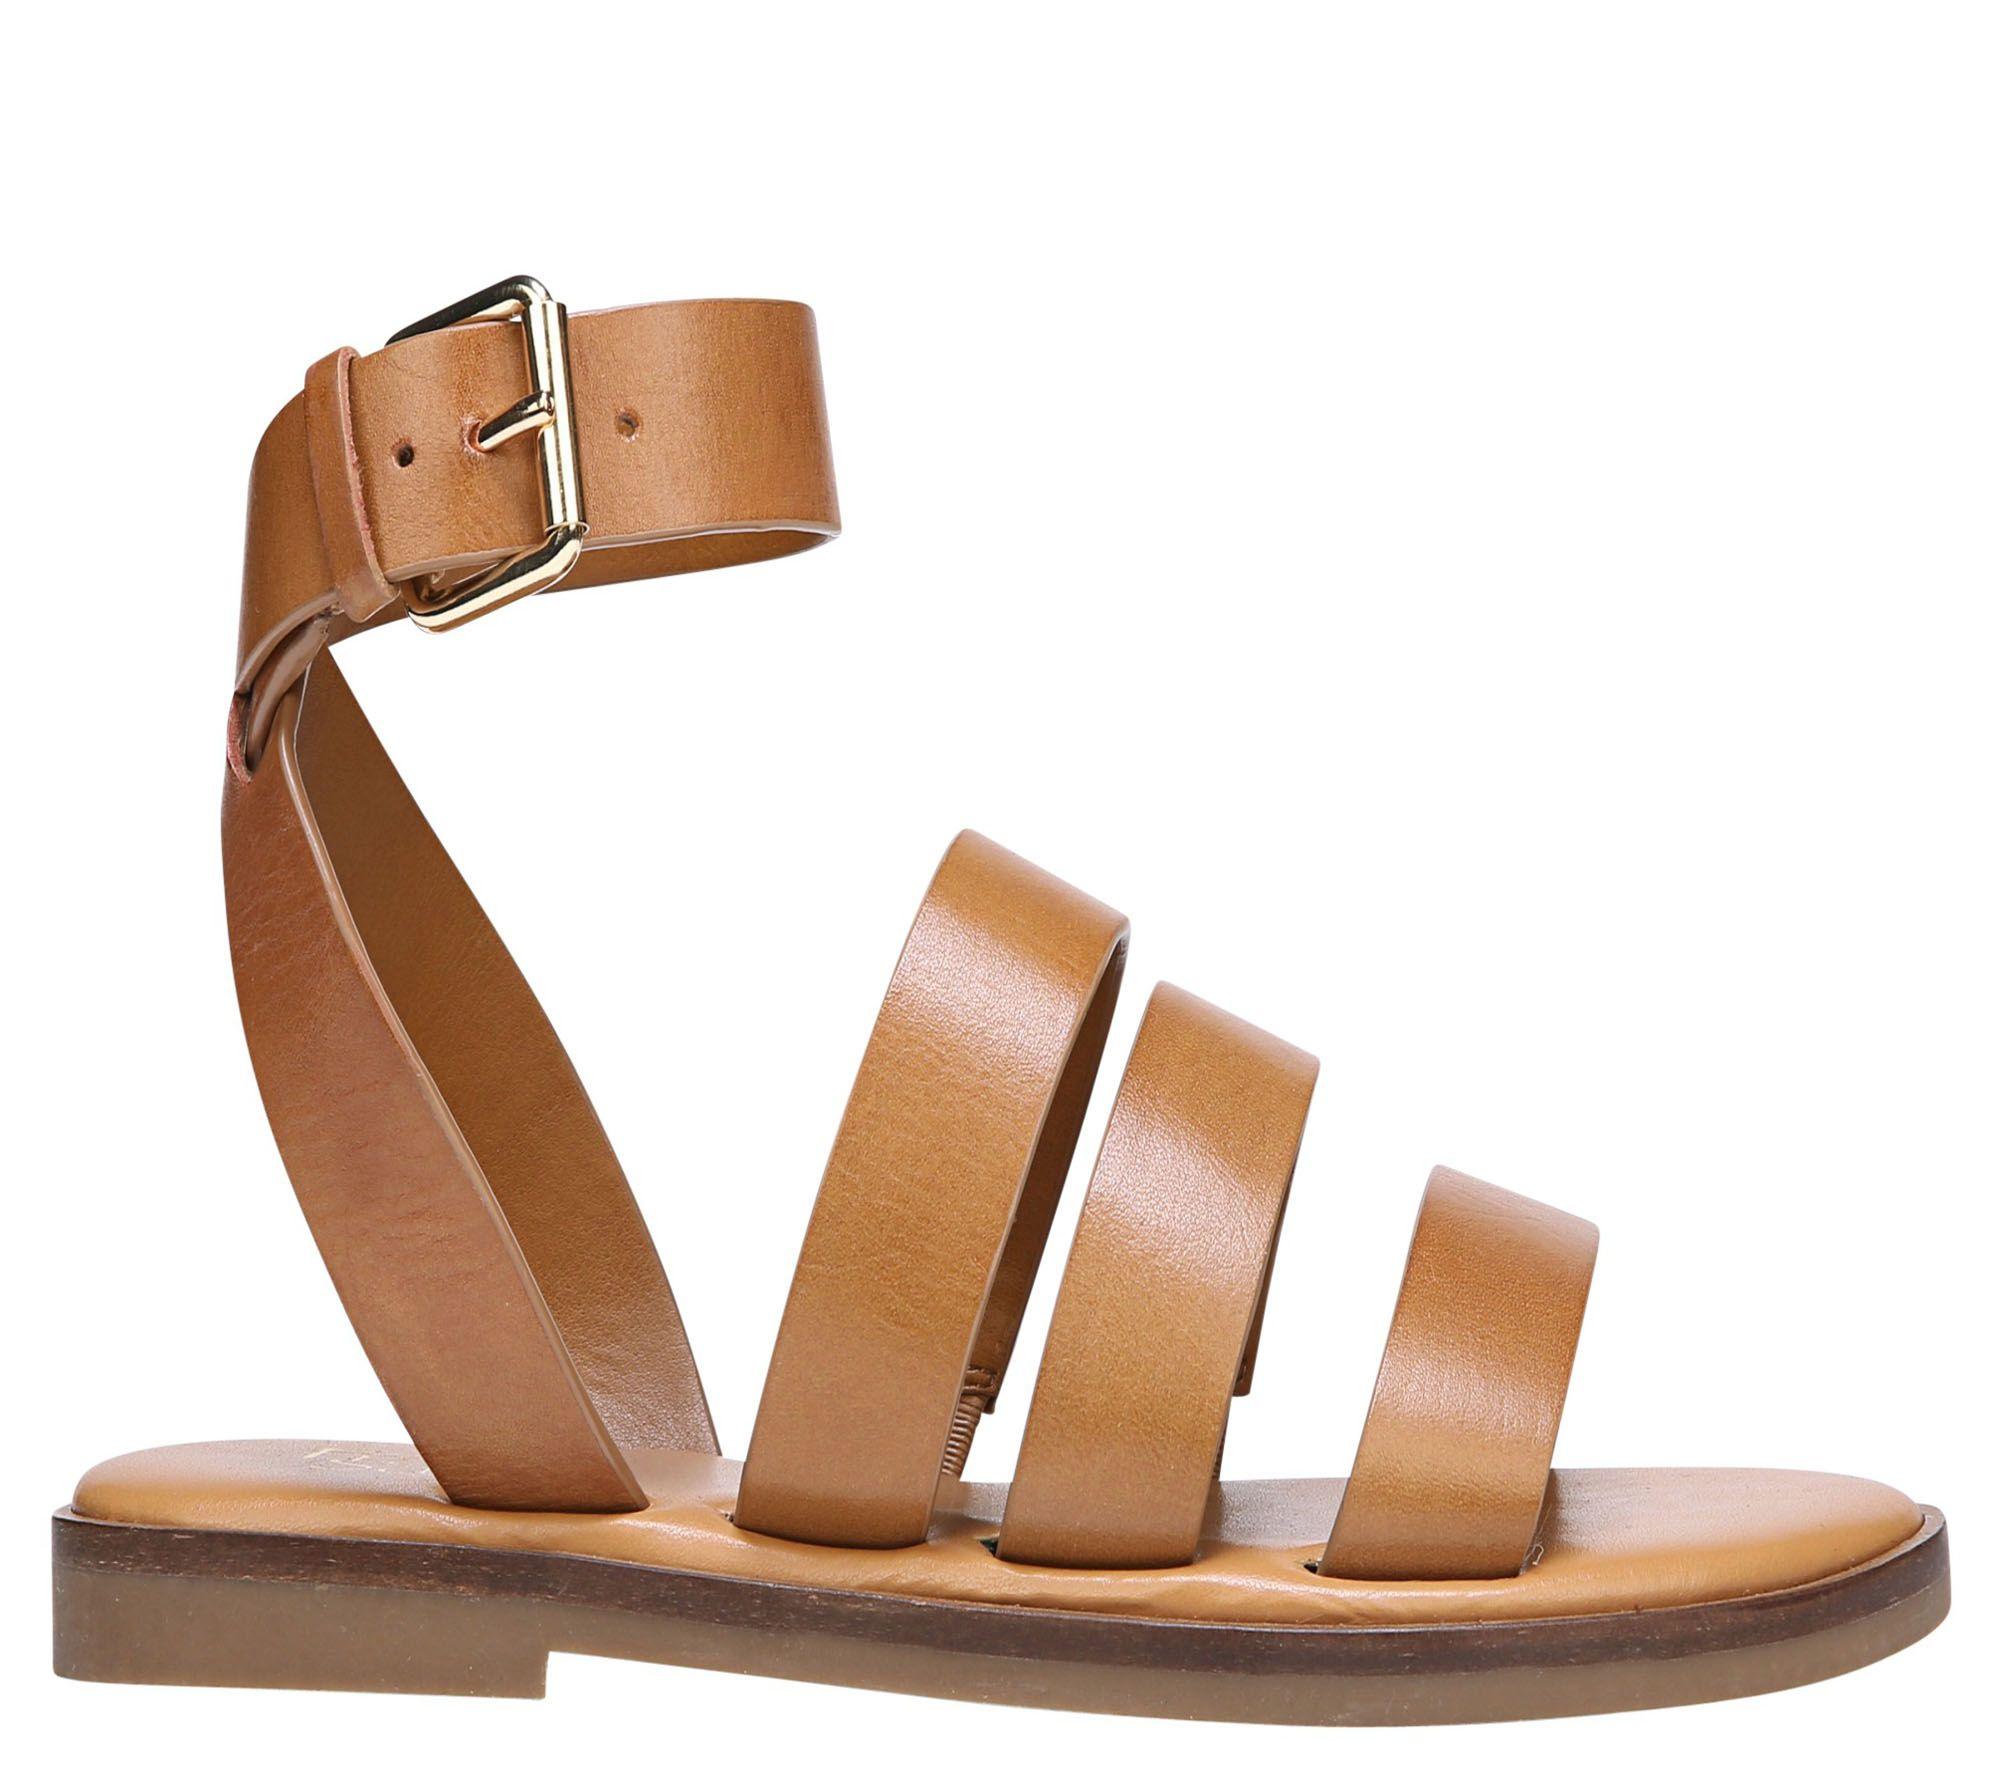 b606baf59976 Franco Sarto Strappy Flat Sandals - Kyson - Page 1 — QVC.com